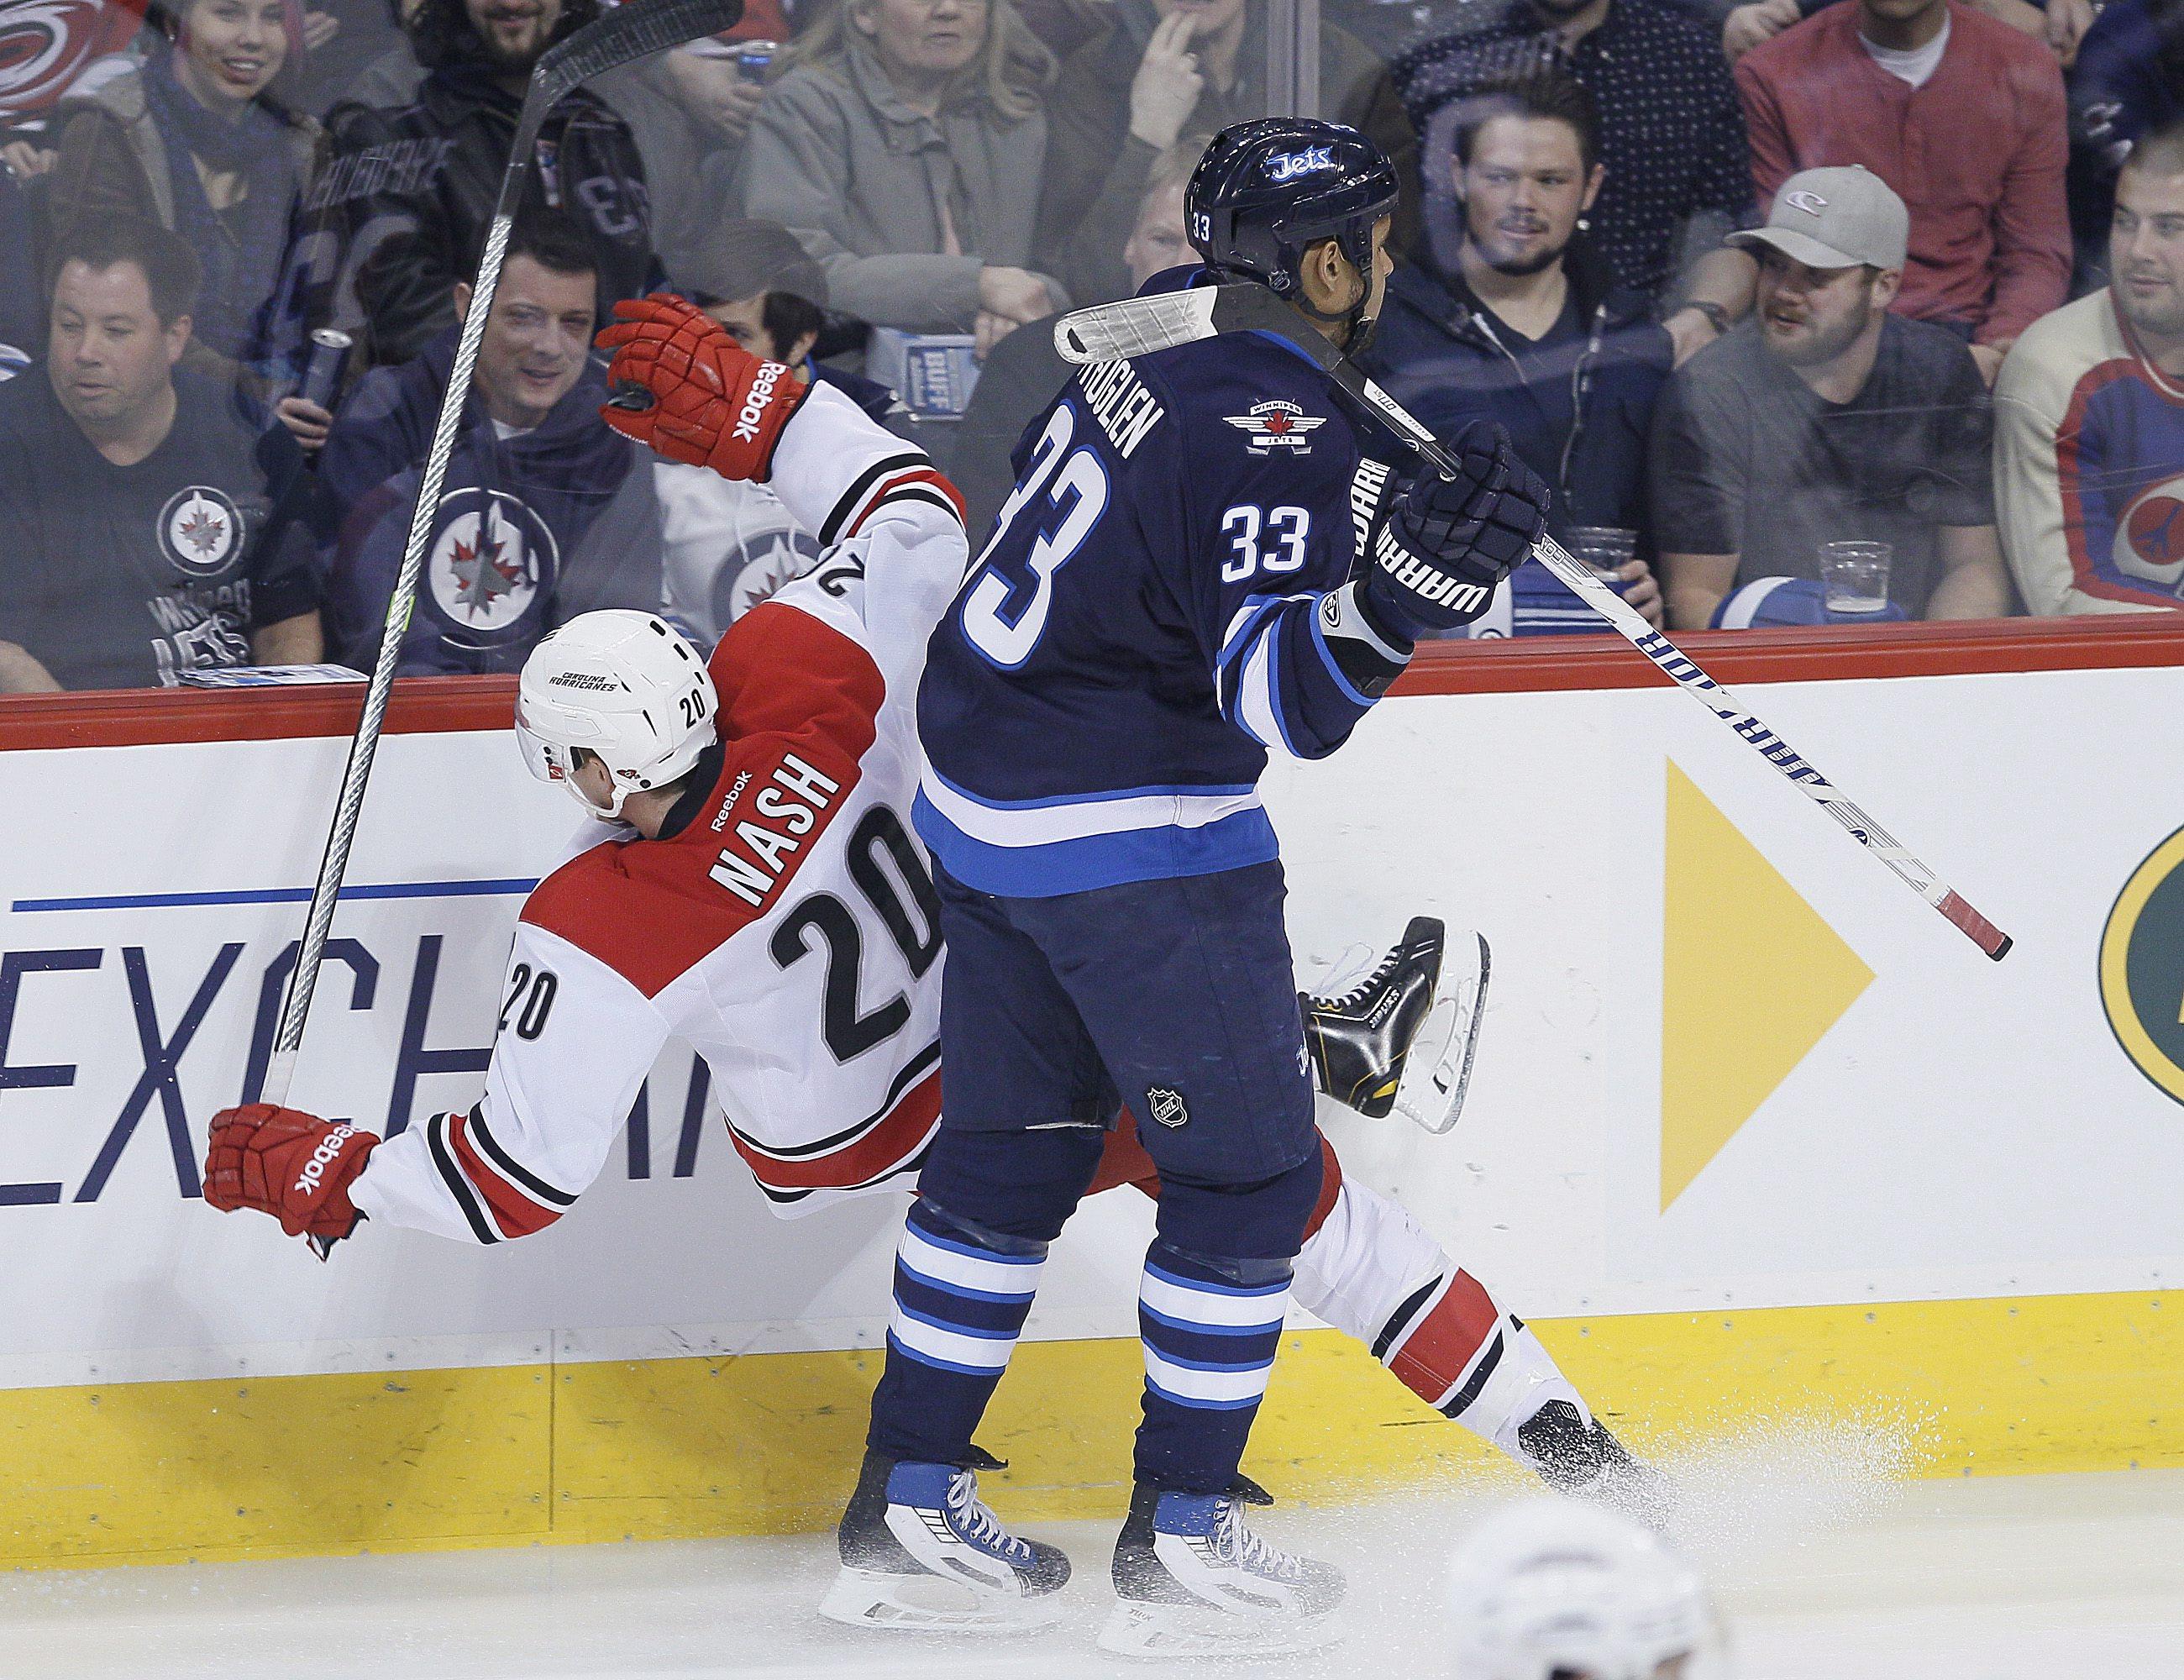 Winnipeg Jets' Dustin Byfuglien (33) dumps Carolina Hurricanes' Riley Nash (20) during the first period of an NHL hockey game, Saturday, March 22, 2014, in Winnipeg, Manitoba